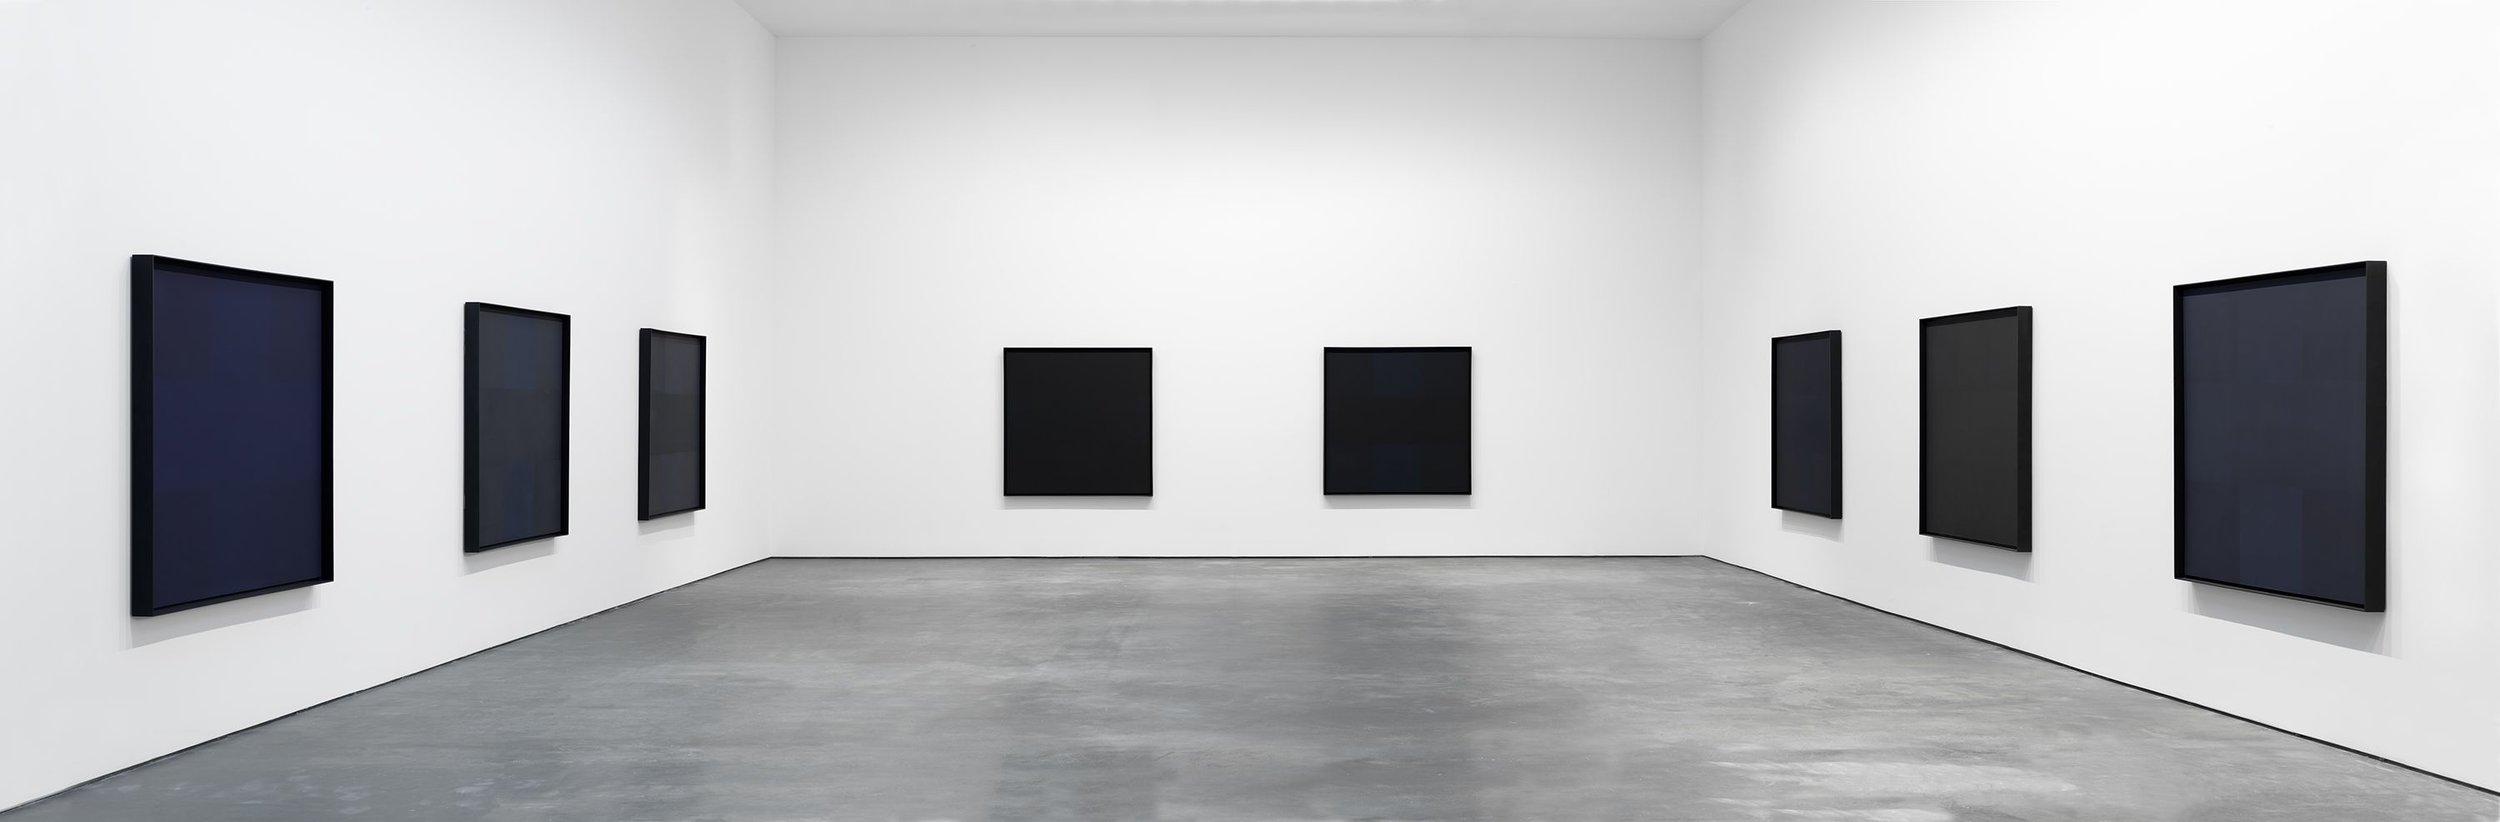 "Ad Reinhard, ""Black Paintings,"" 1954-1967 Installation view. (Courtesy David Zwirner)"